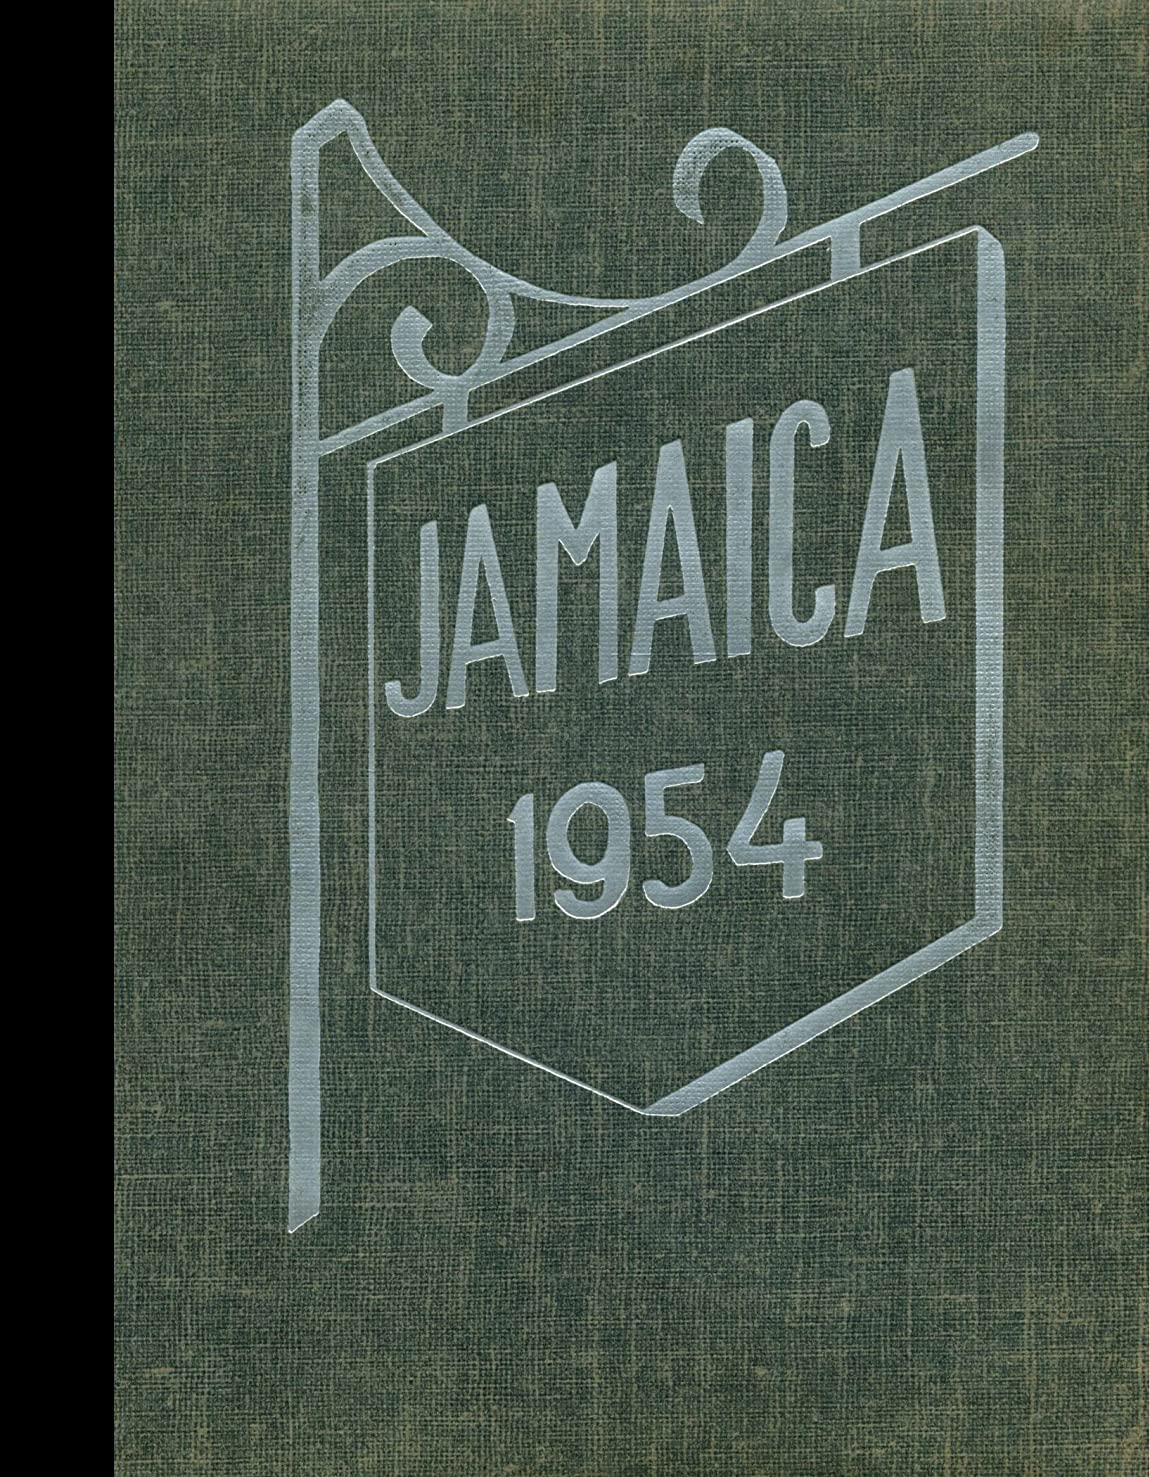 (Reprint) 1954 Yearbook: Jamaica High School, Jamaica, New York